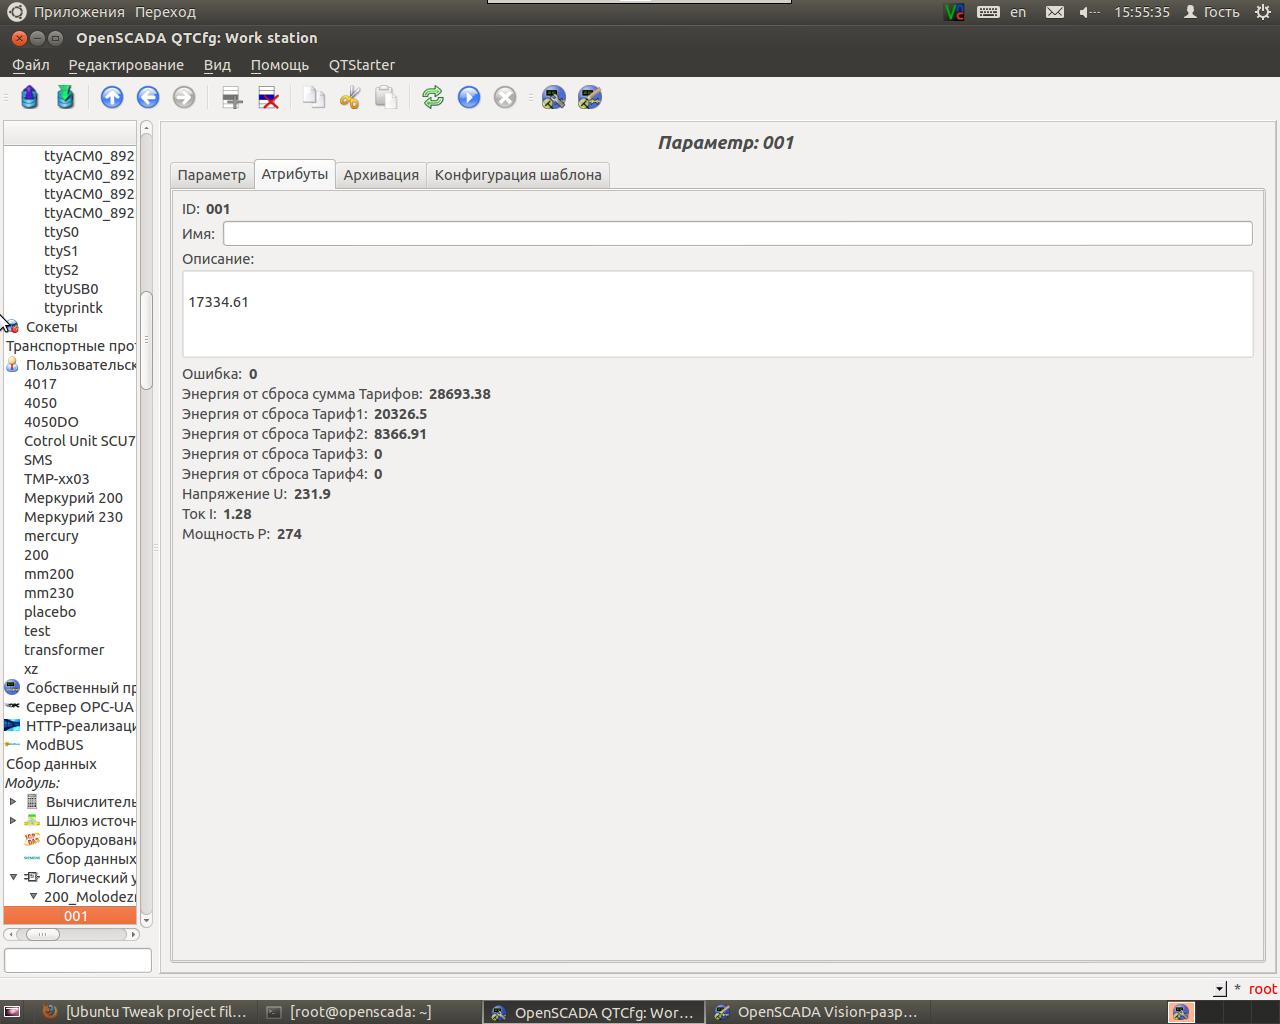 Пишем протоколы счетчиков Меркурий 230 и Меркурий 200 для OpenSCADA - 27